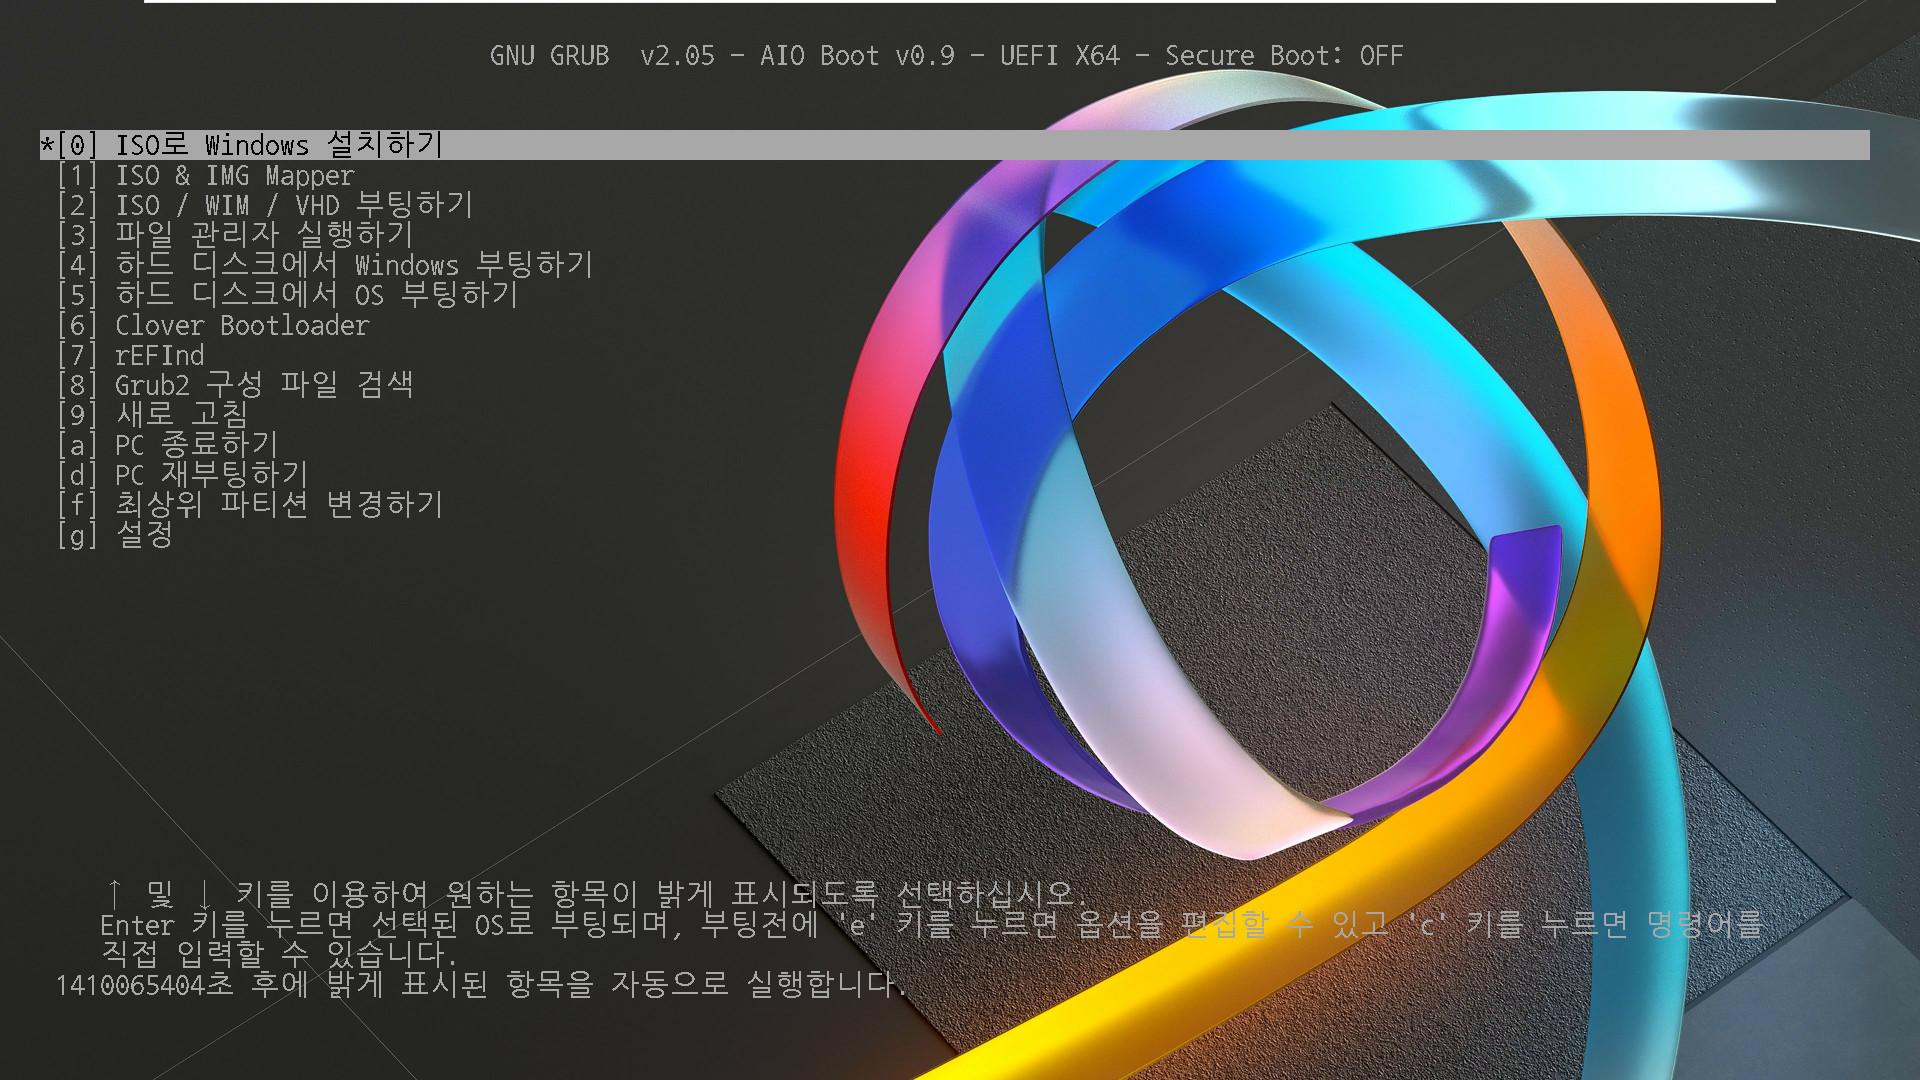 AIO Boot에 NanumGothicCoding2.0_30.pf2 만들어서 적용함 2020-09-14_170519.jpg